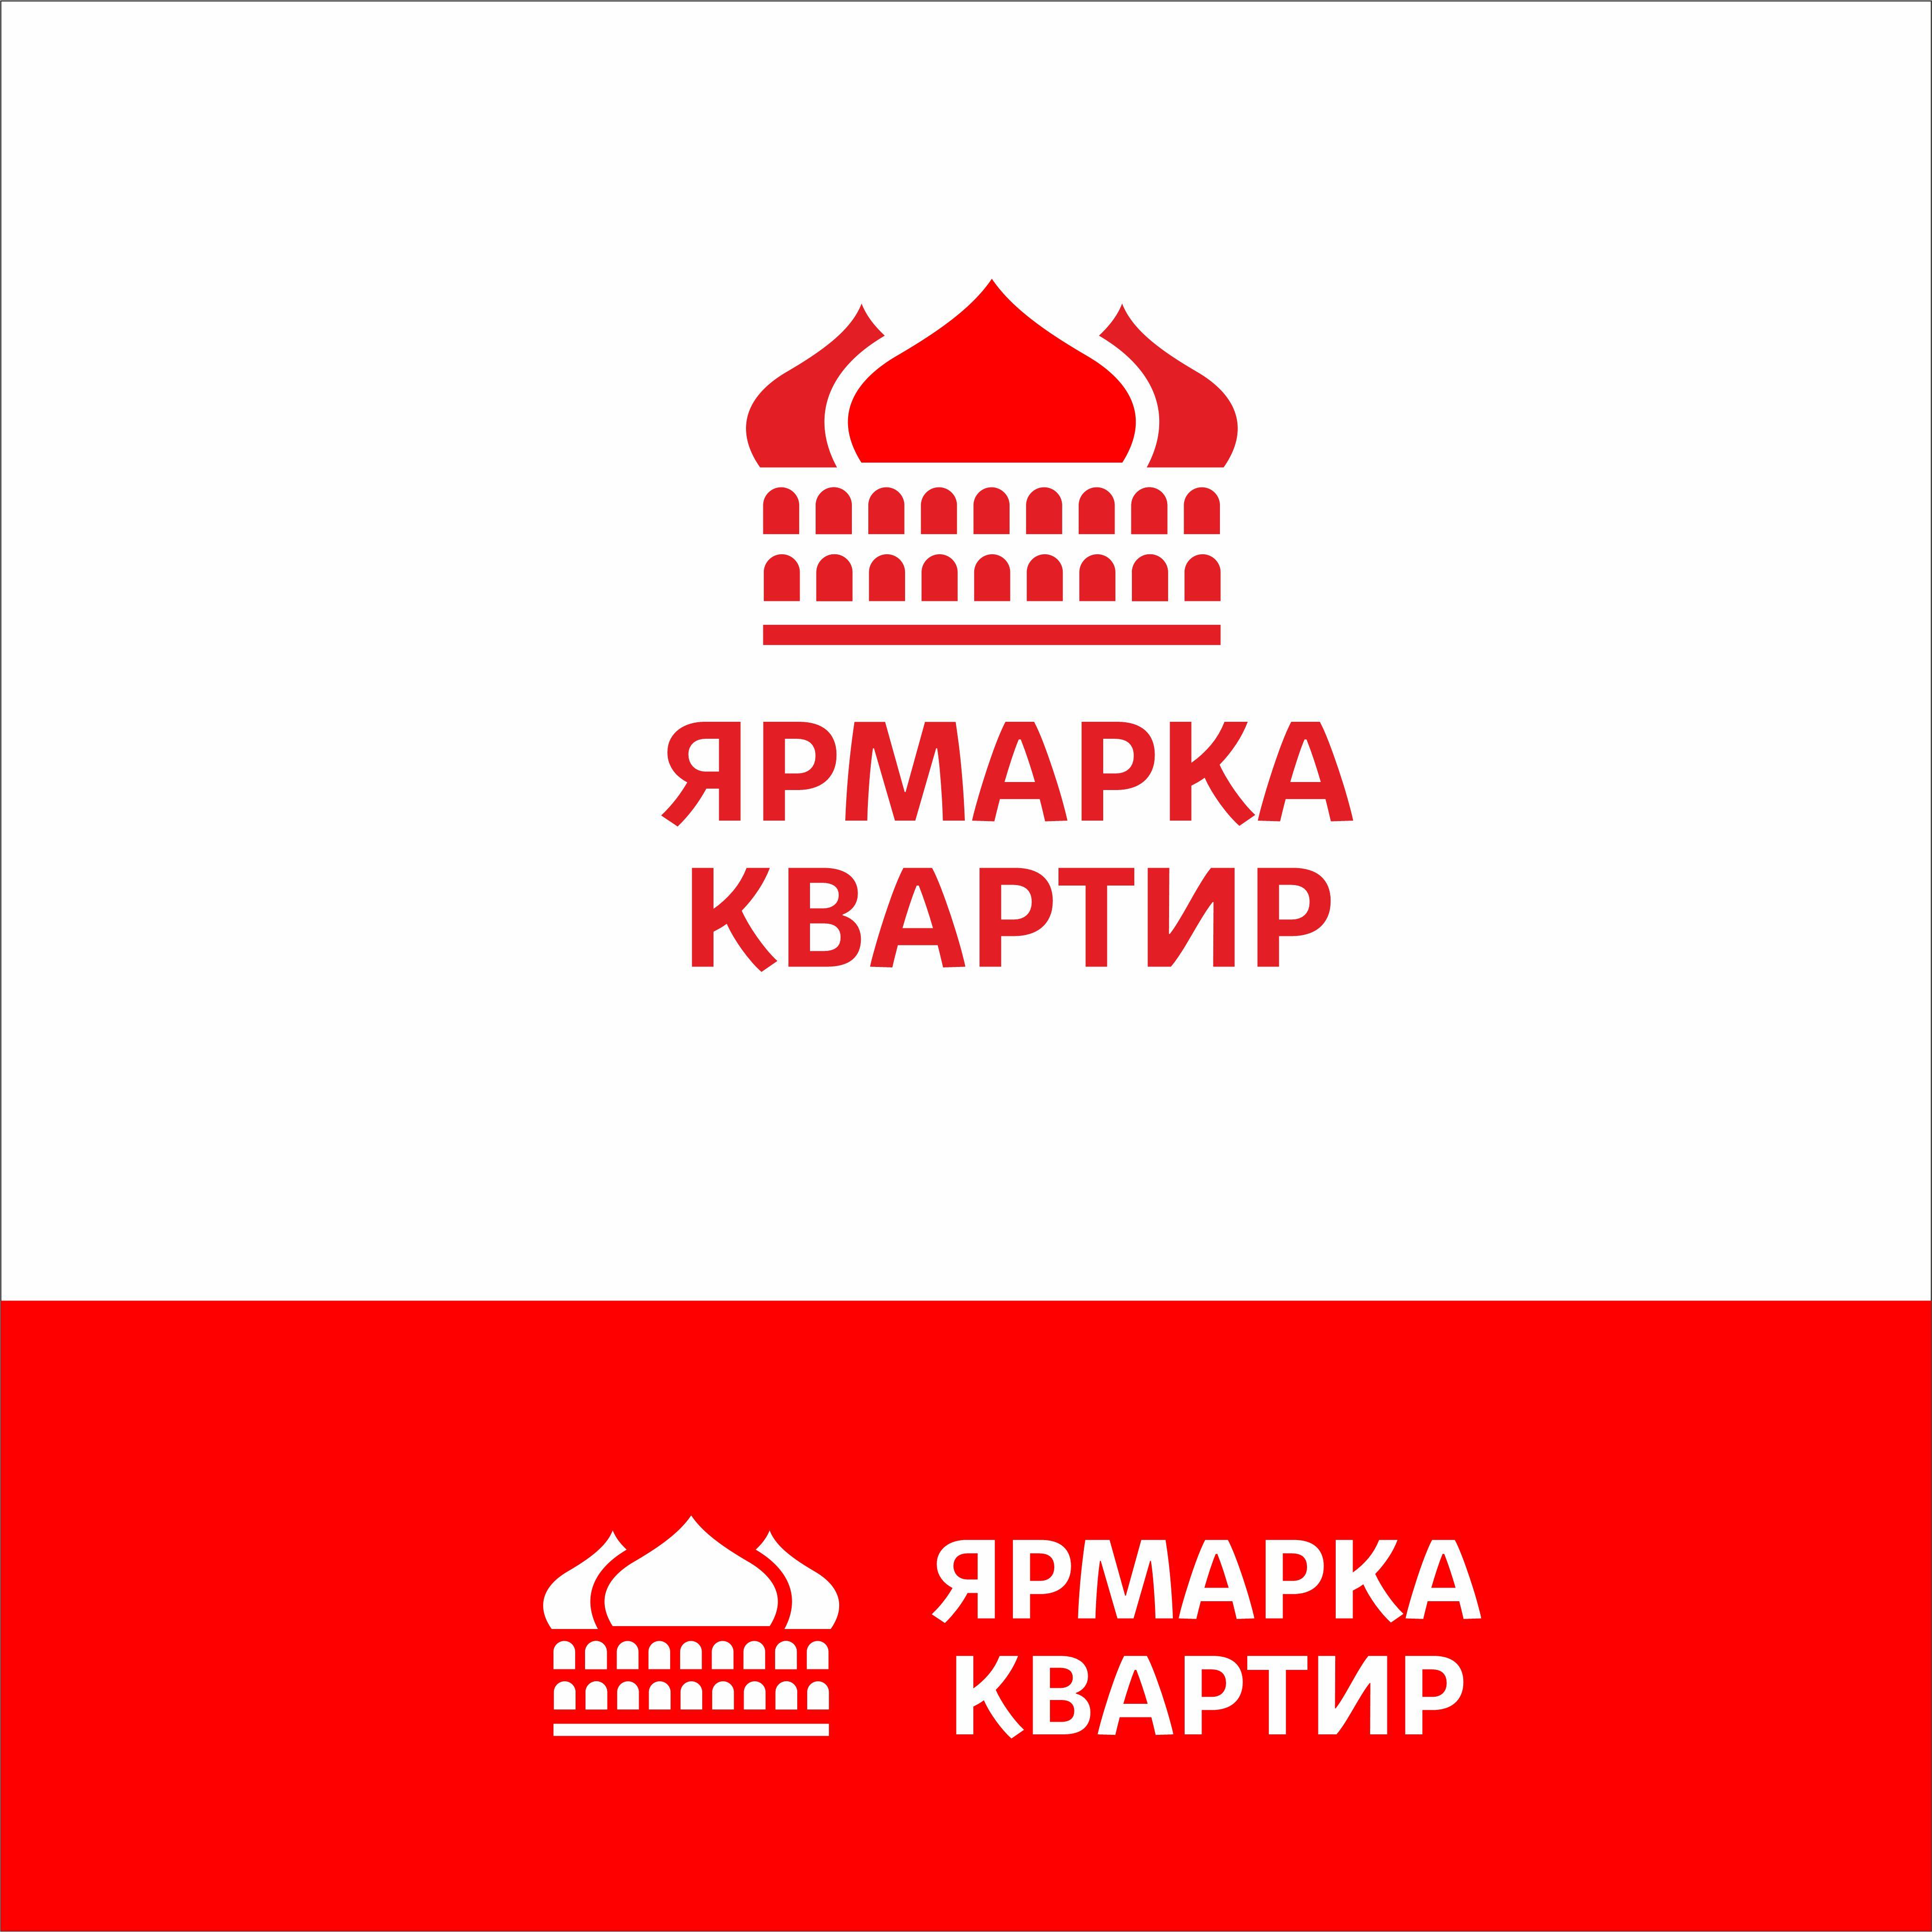 Создание логотипа, с вариантами для визитки и листовки фото f_2936004678bc2f75.jpg